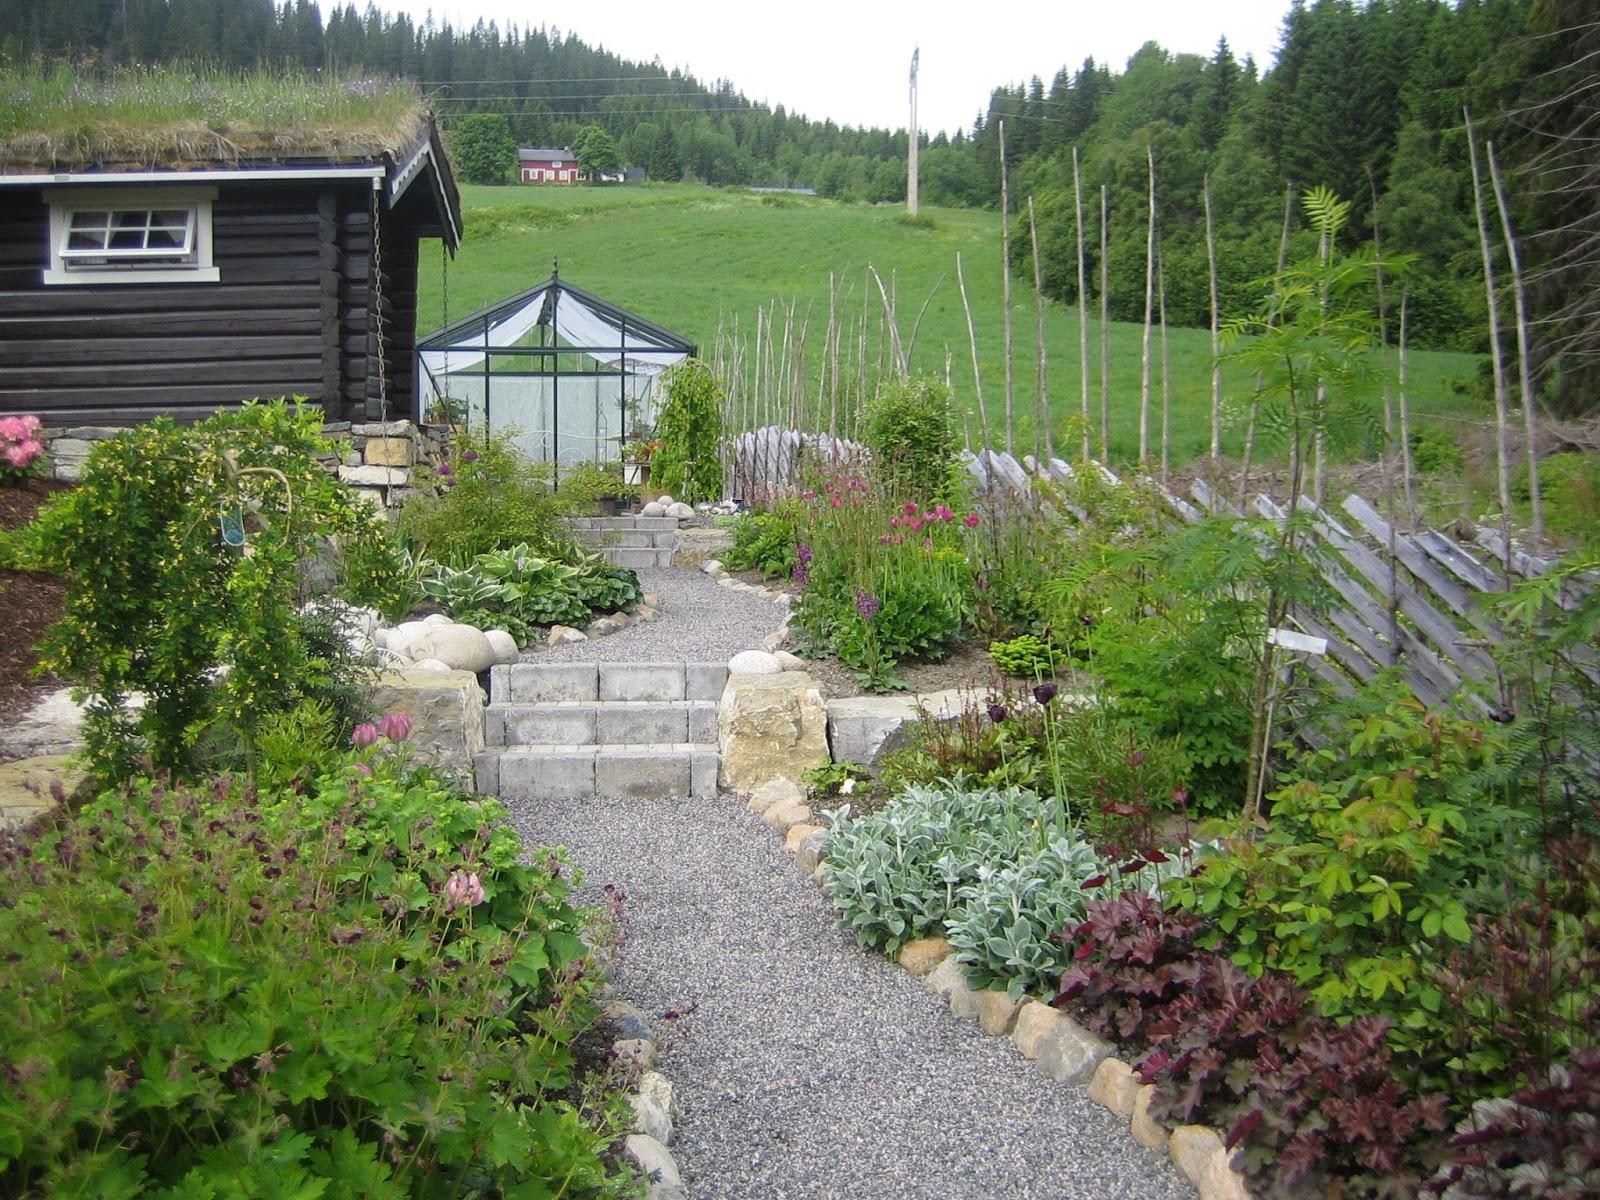 Annes Hus og Hage: Hageplanlegging